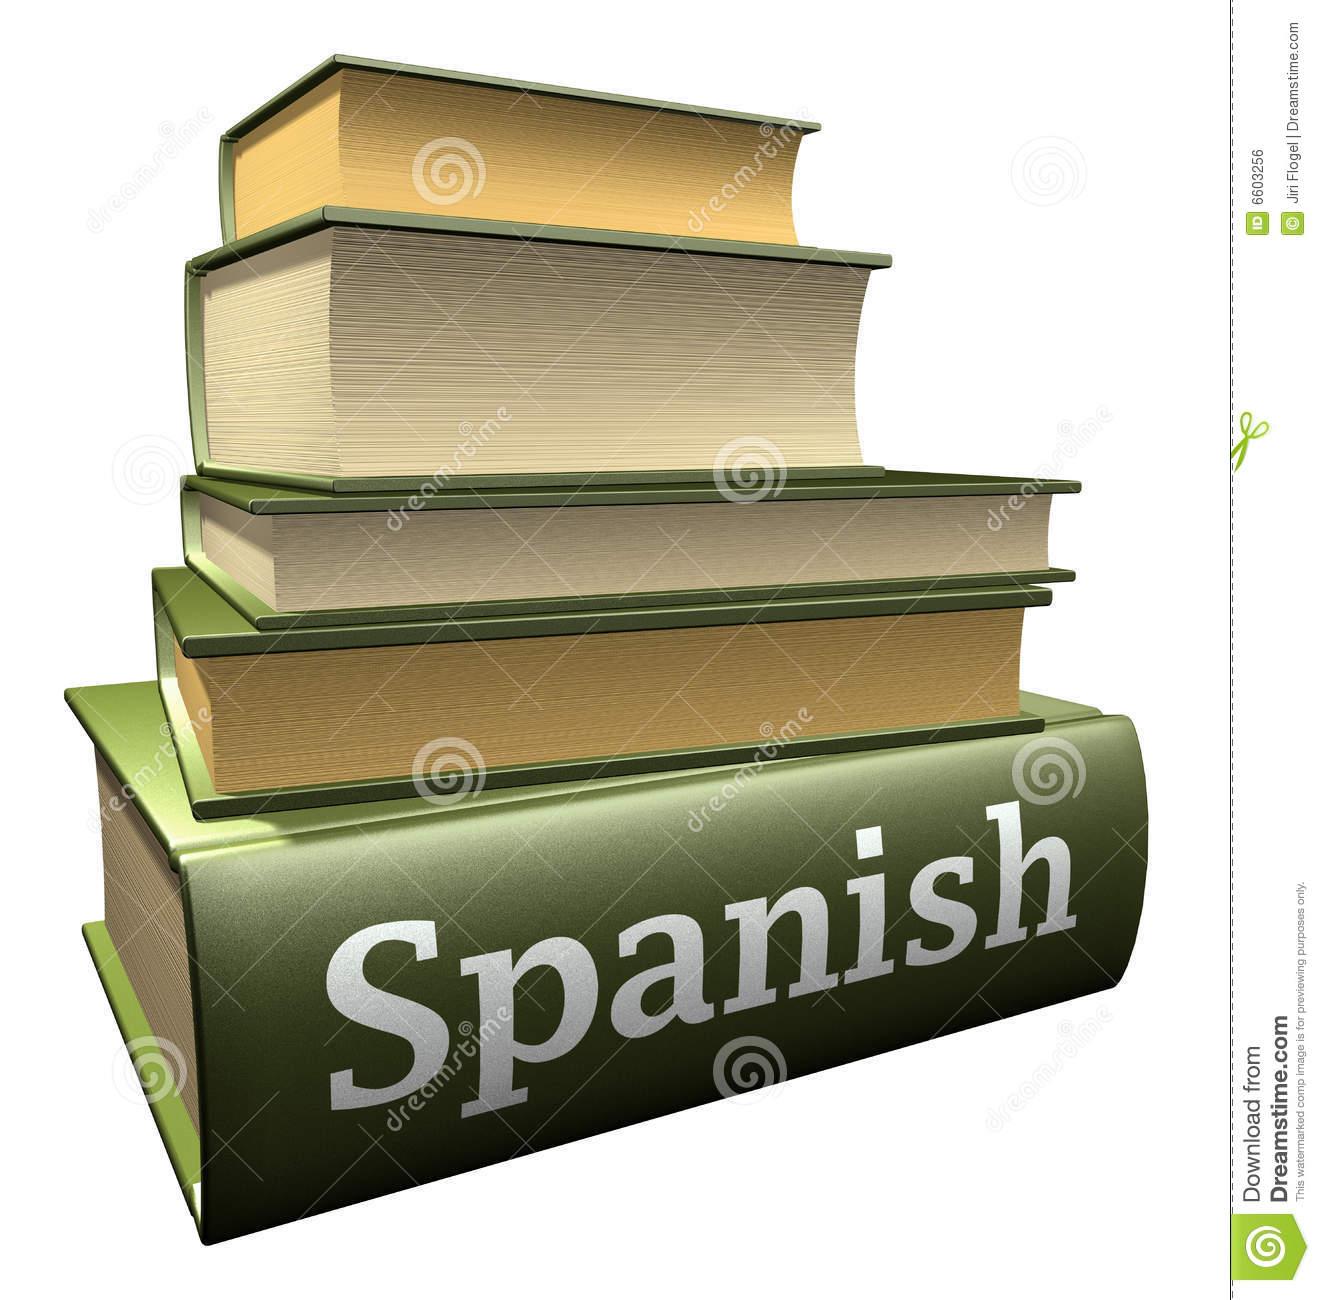 Spanish book clipart.